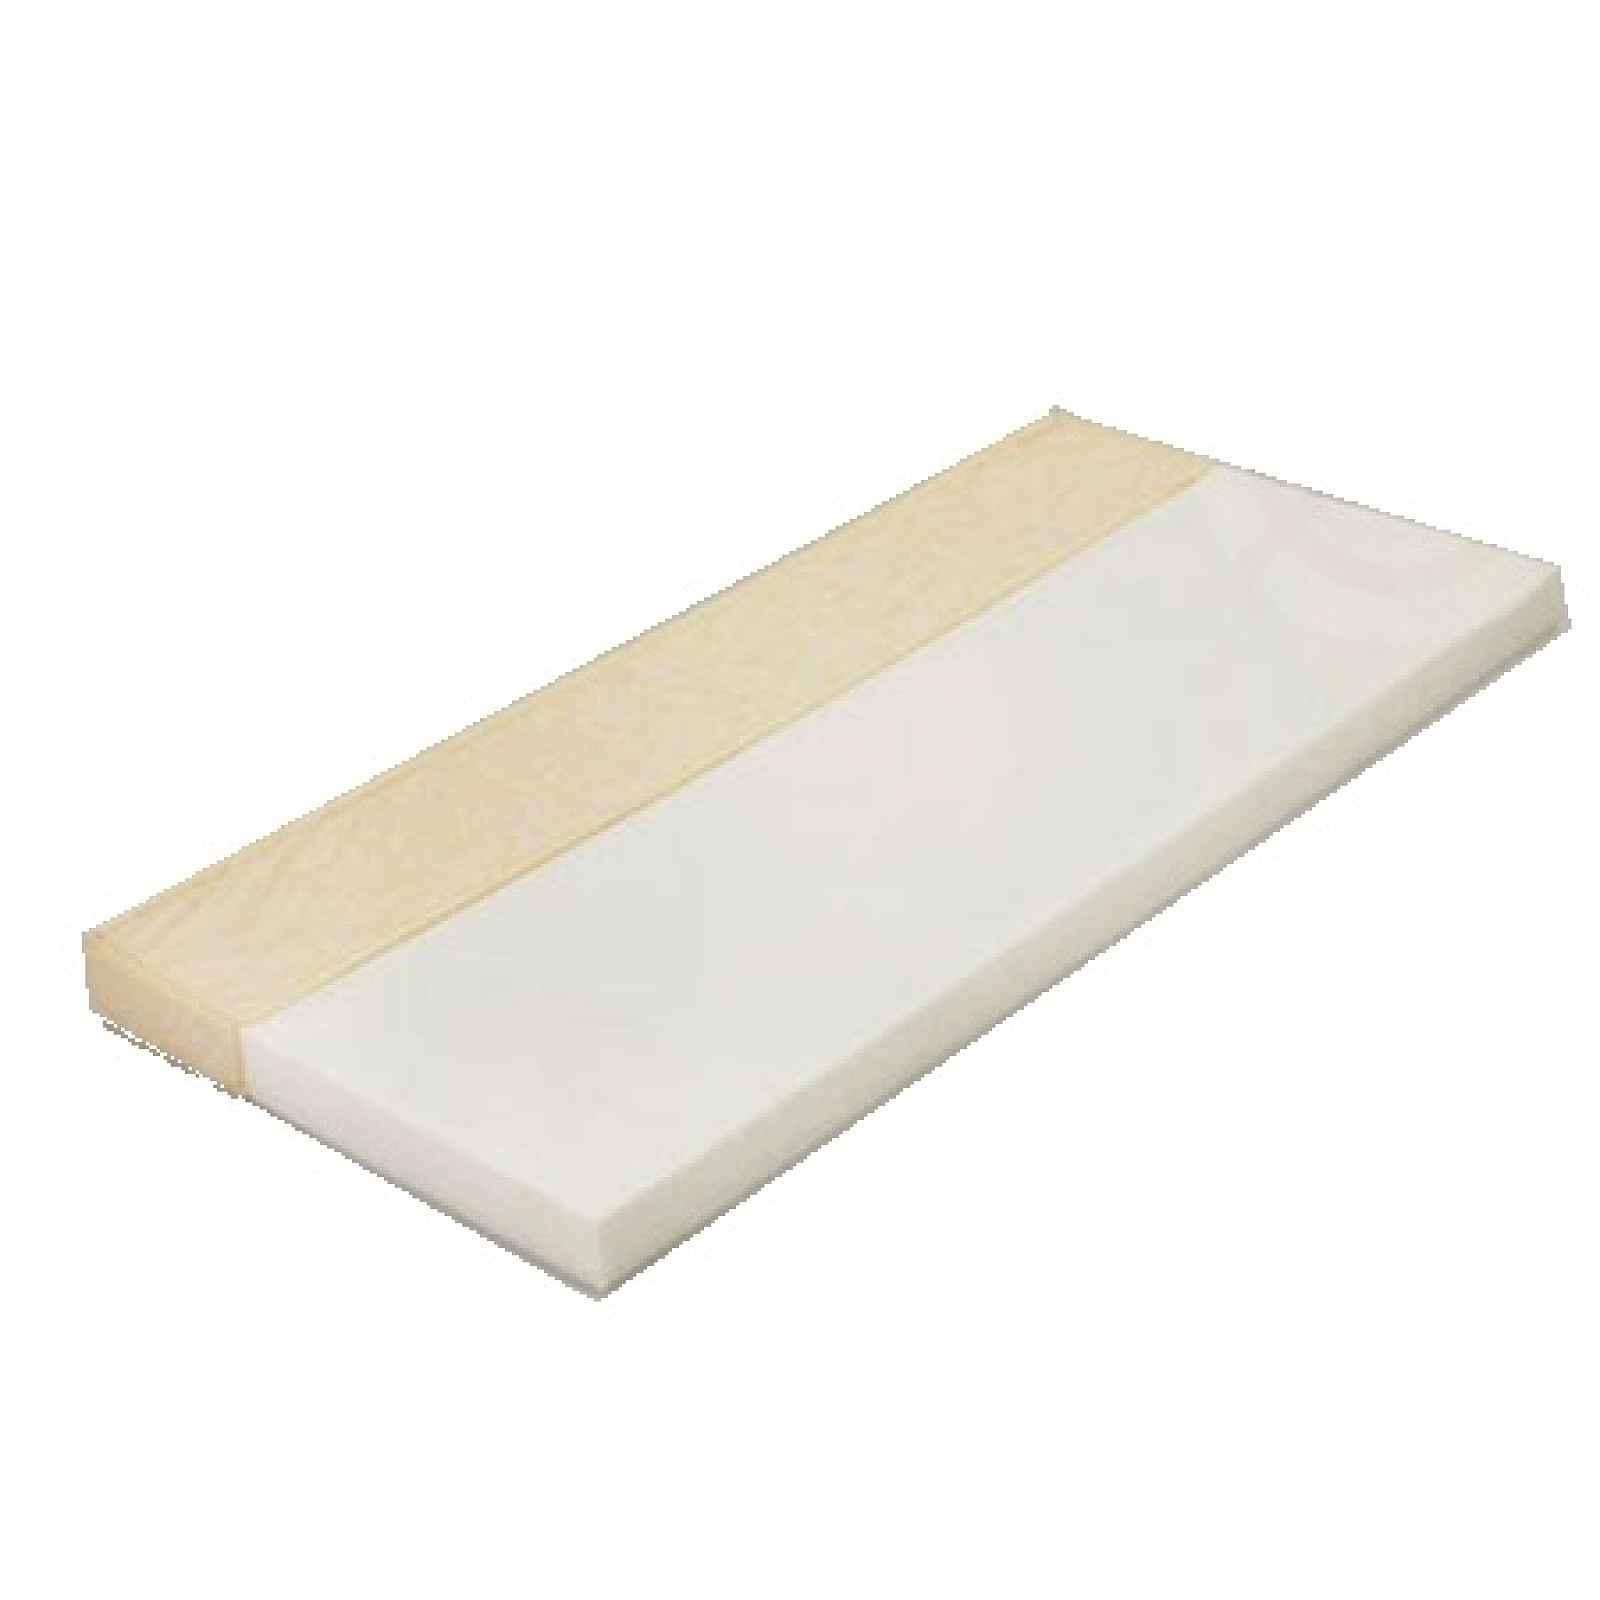 Matrace k posteli LORENTO L16 - rozměr 80x200